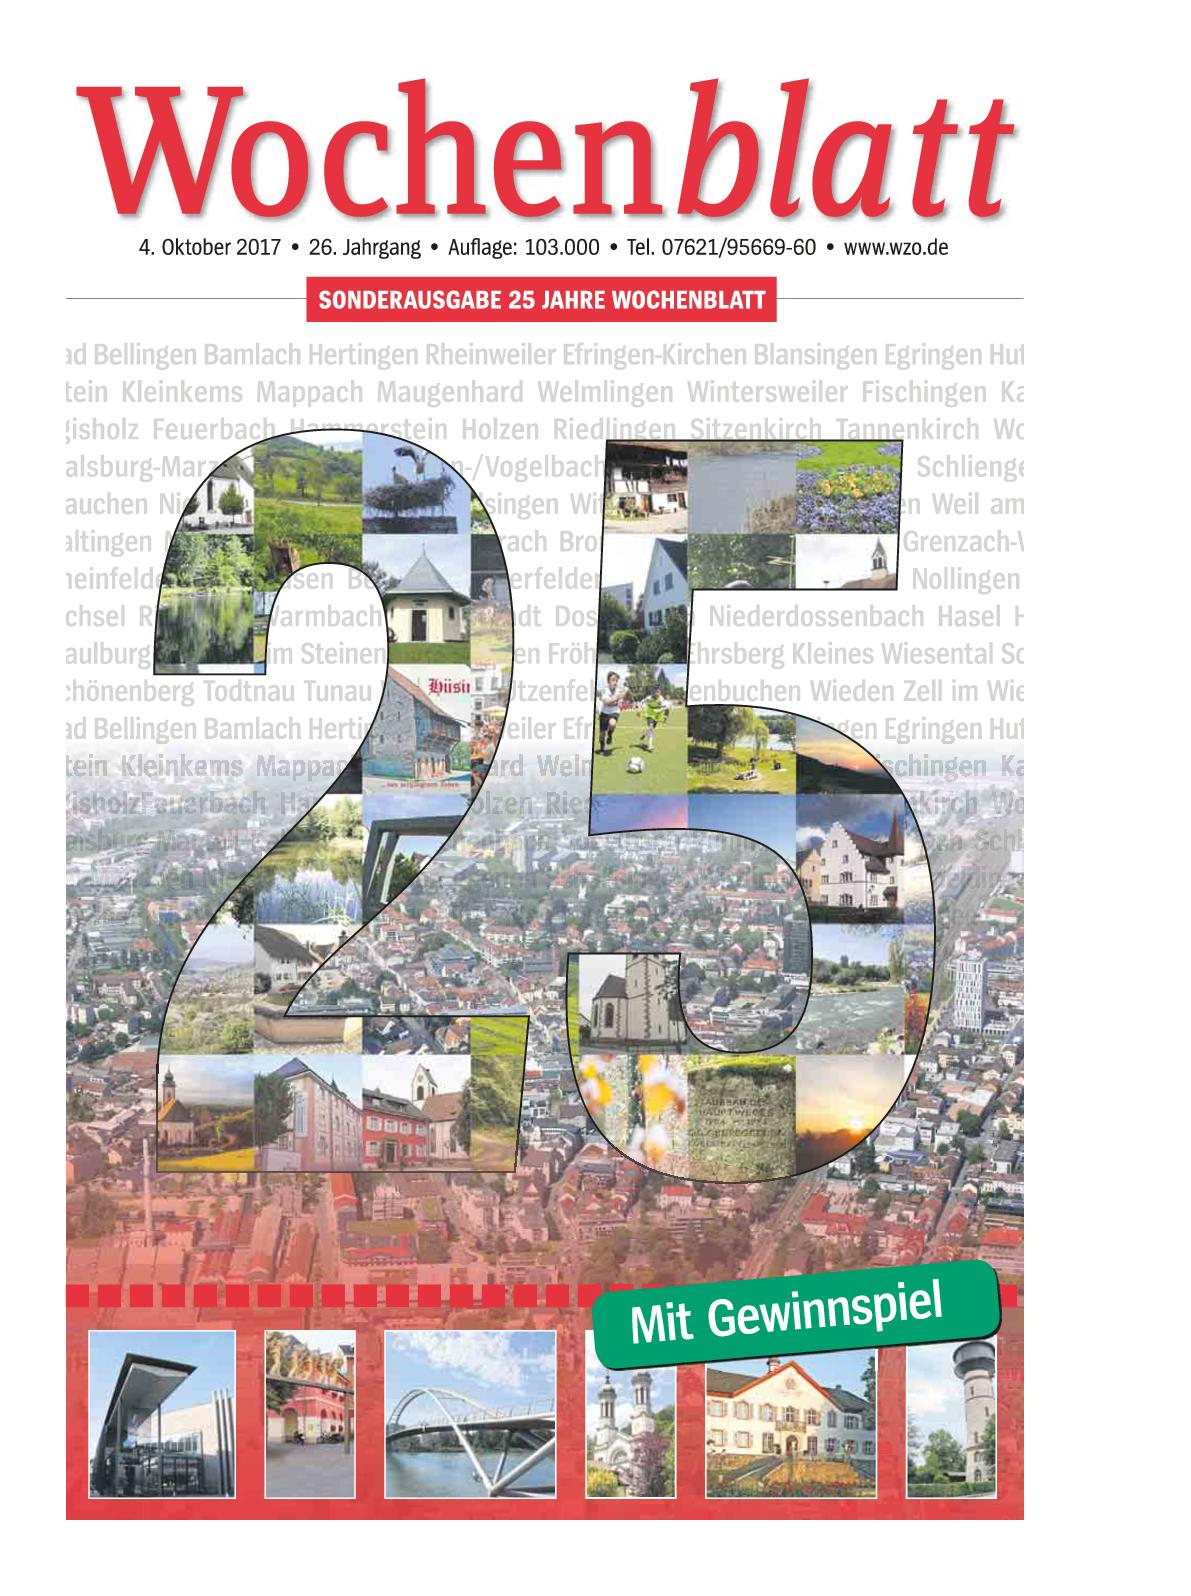 Calaméo 25 Jahre Wochenblatt